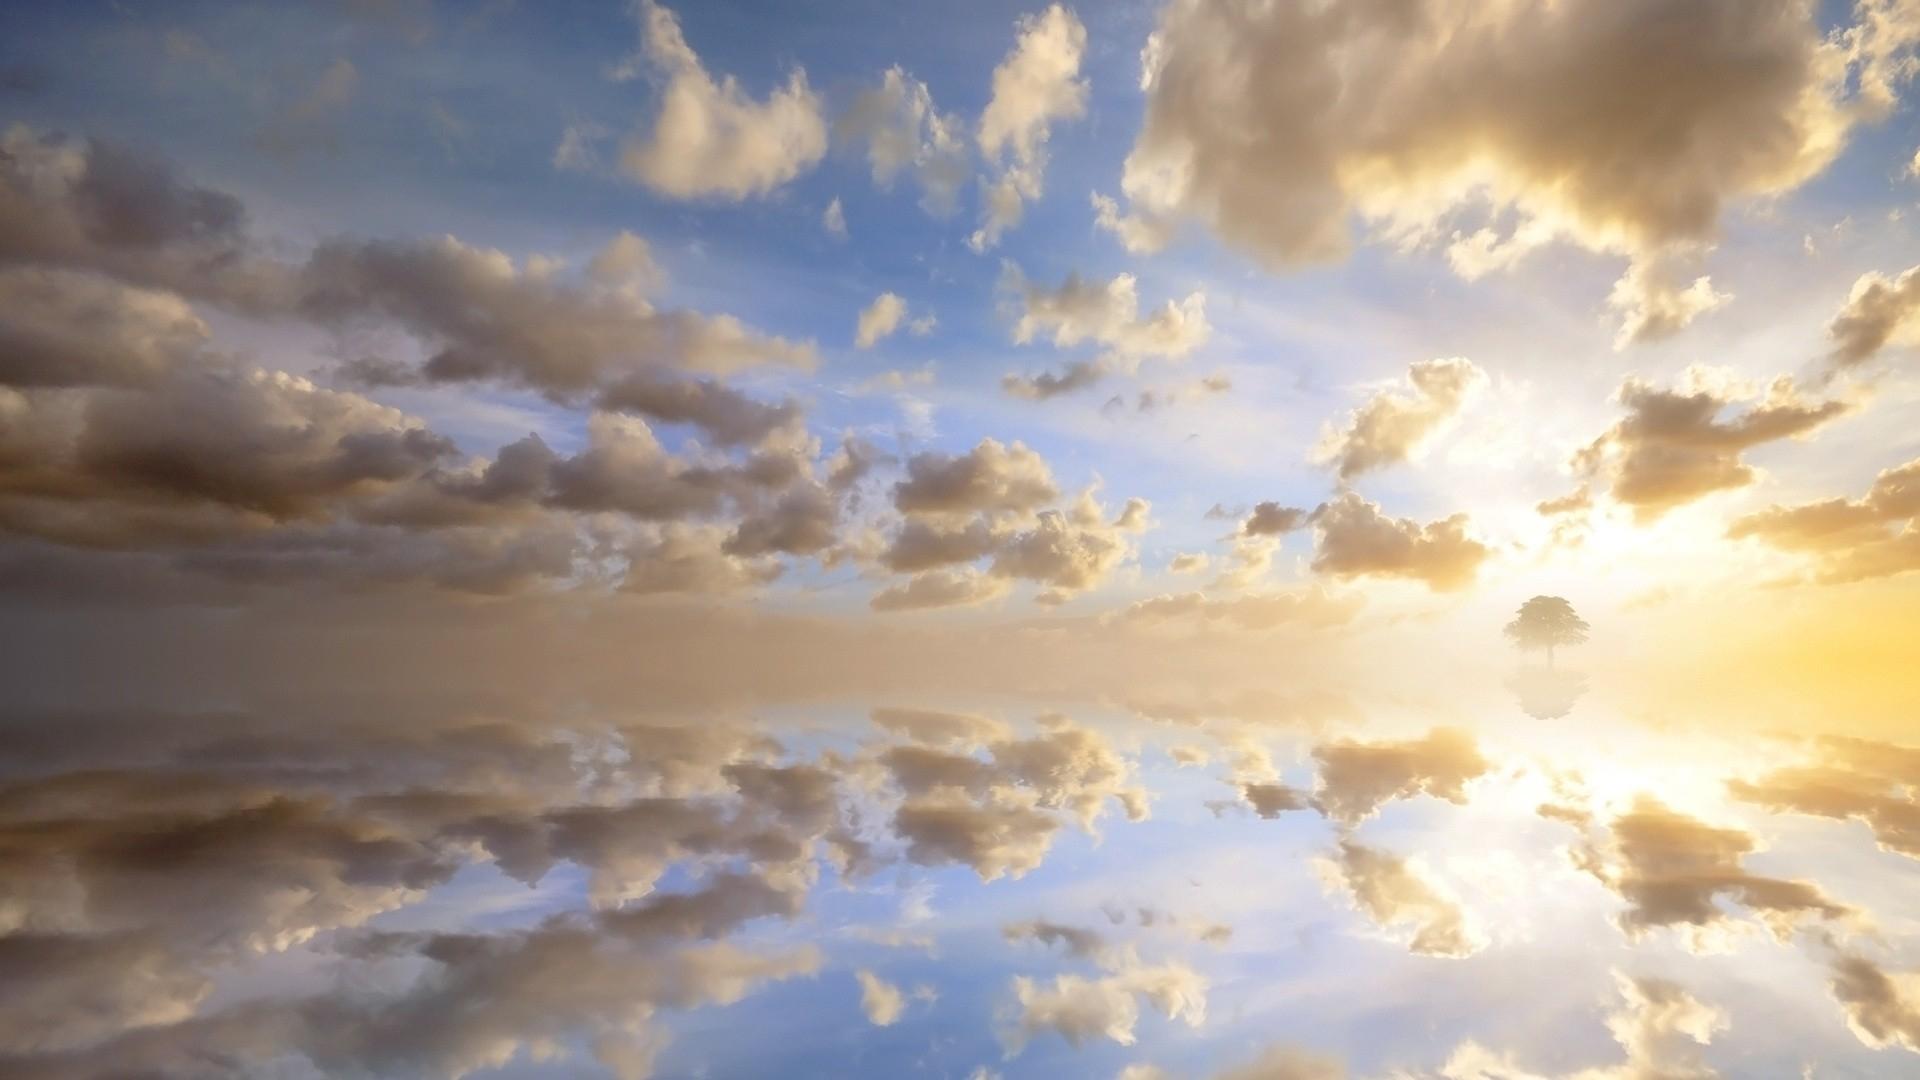 Mystic Falls Wallpaper Beautiful Cloudy Sky Wallpaper 1920x1080 29298